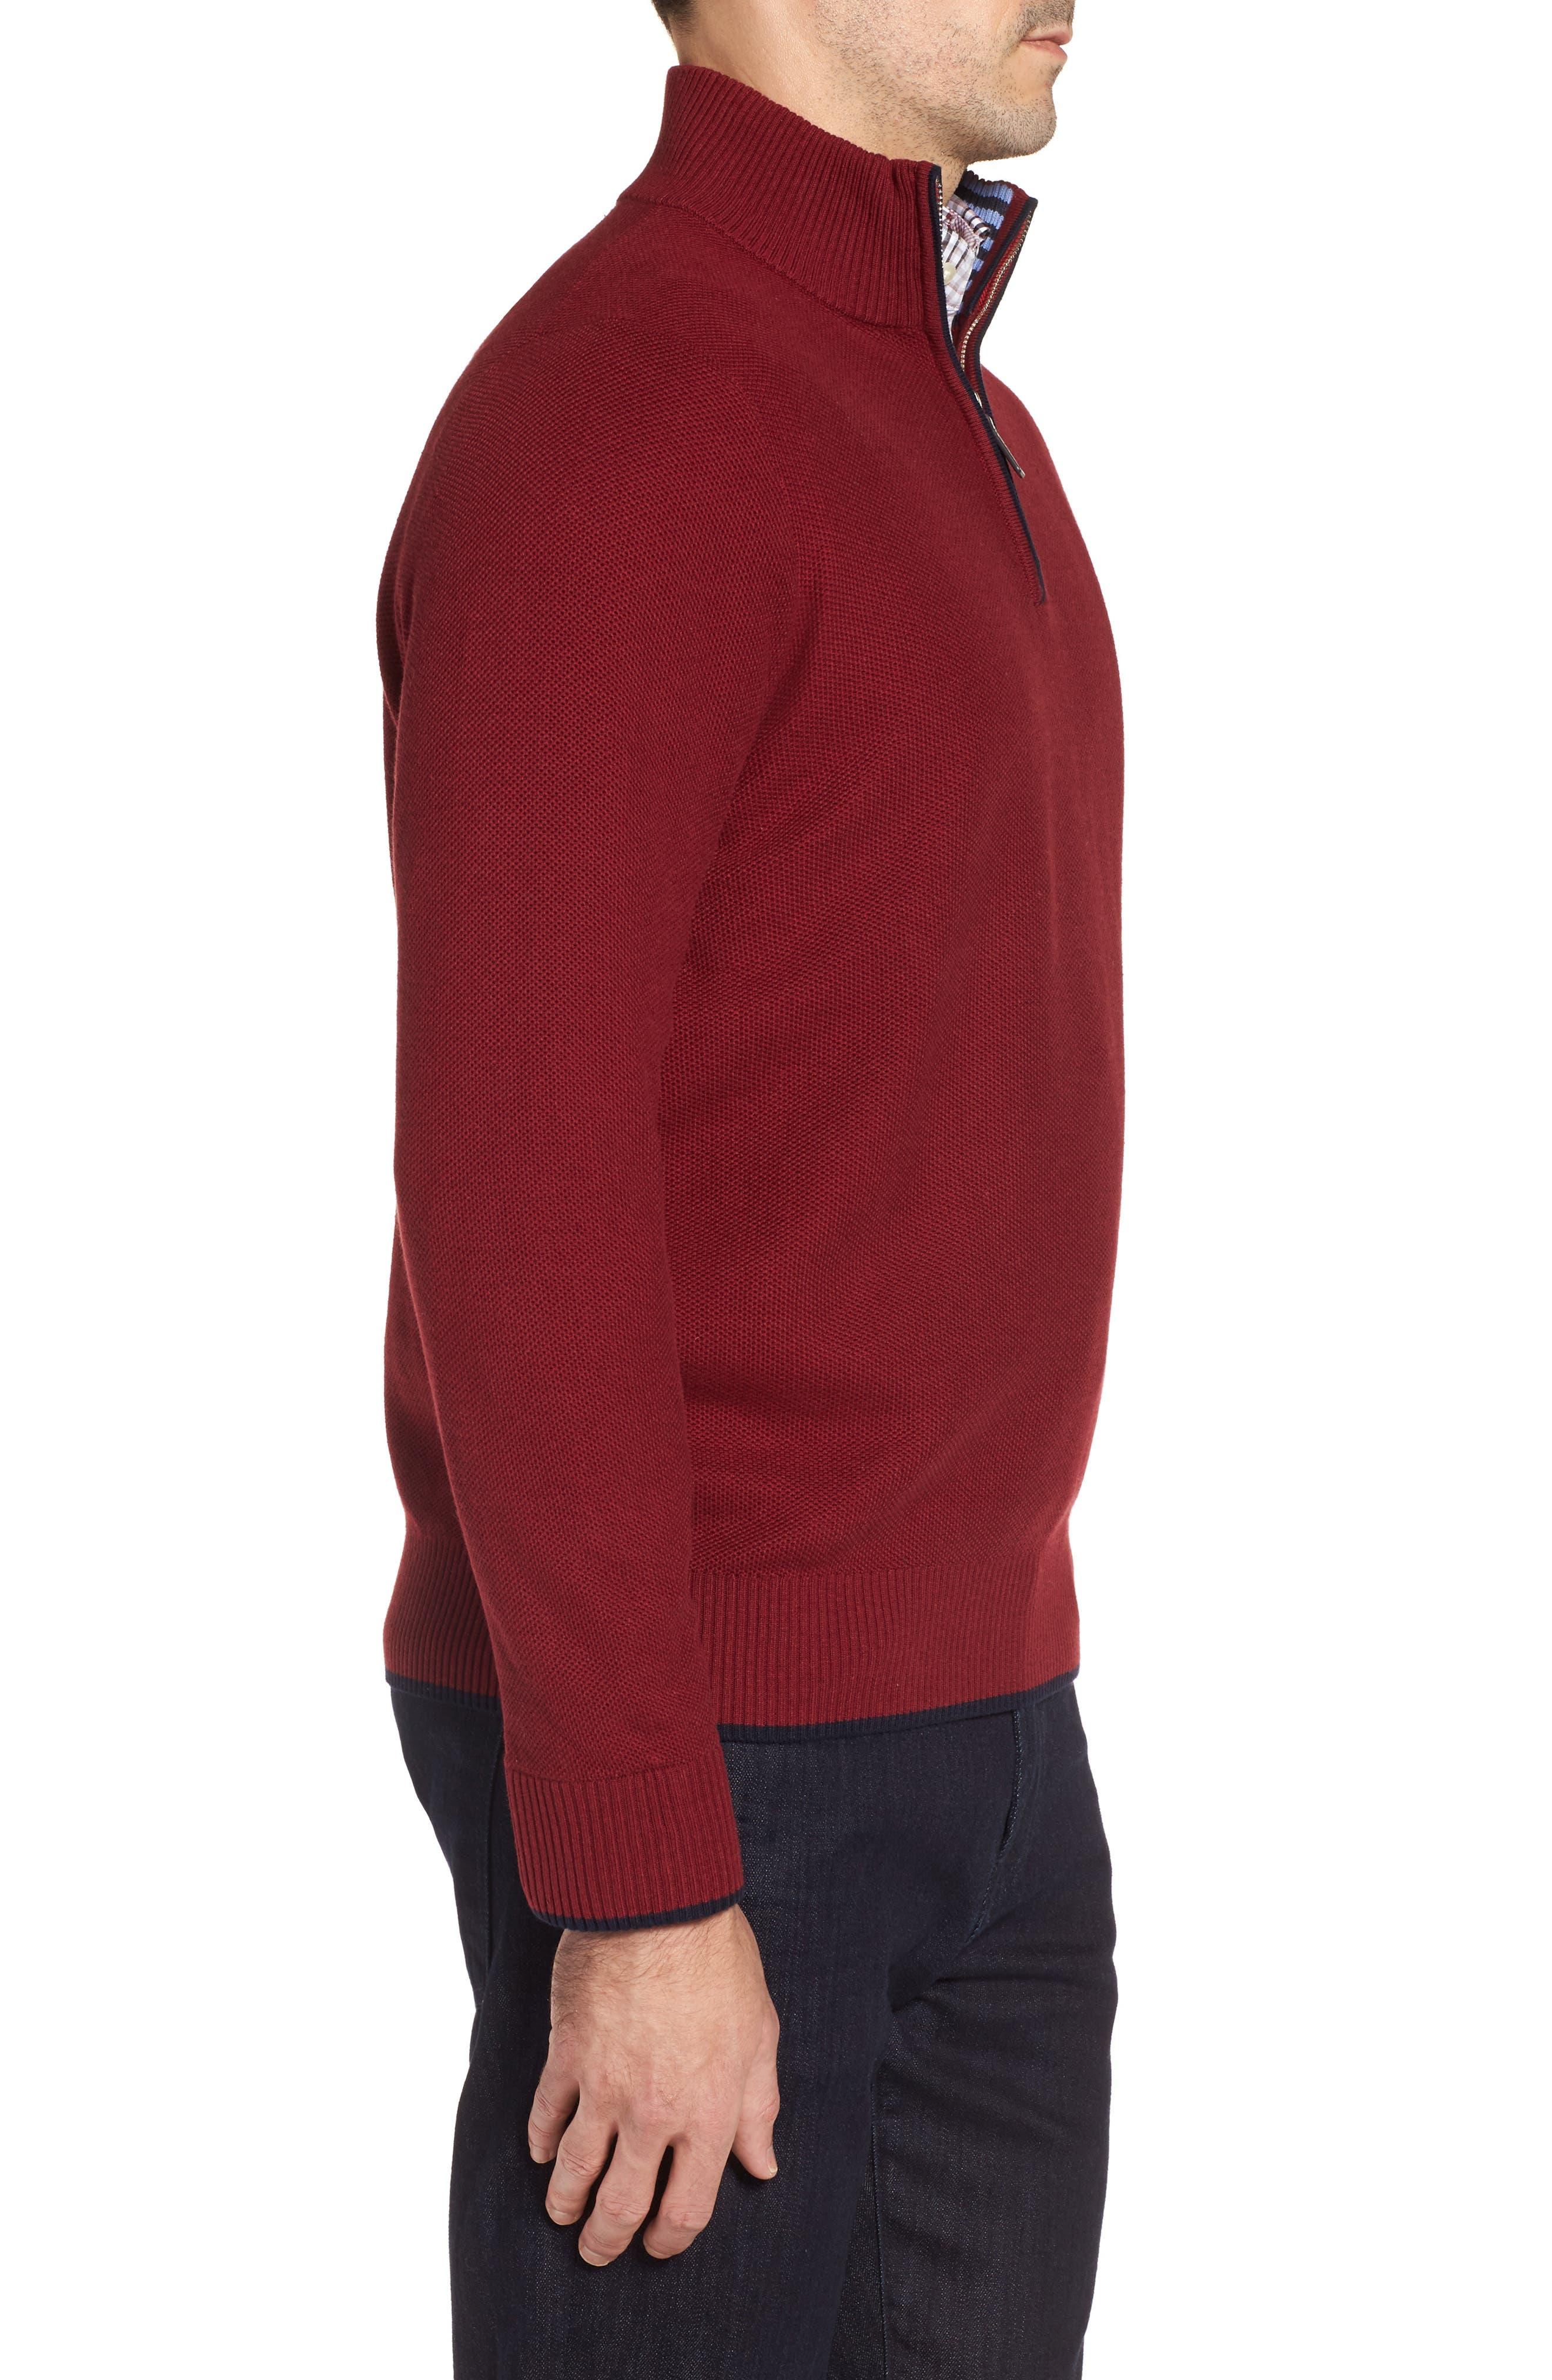 Alternate Image 3  - TailorByrd Prien Tipped Quarter Zip Sweater